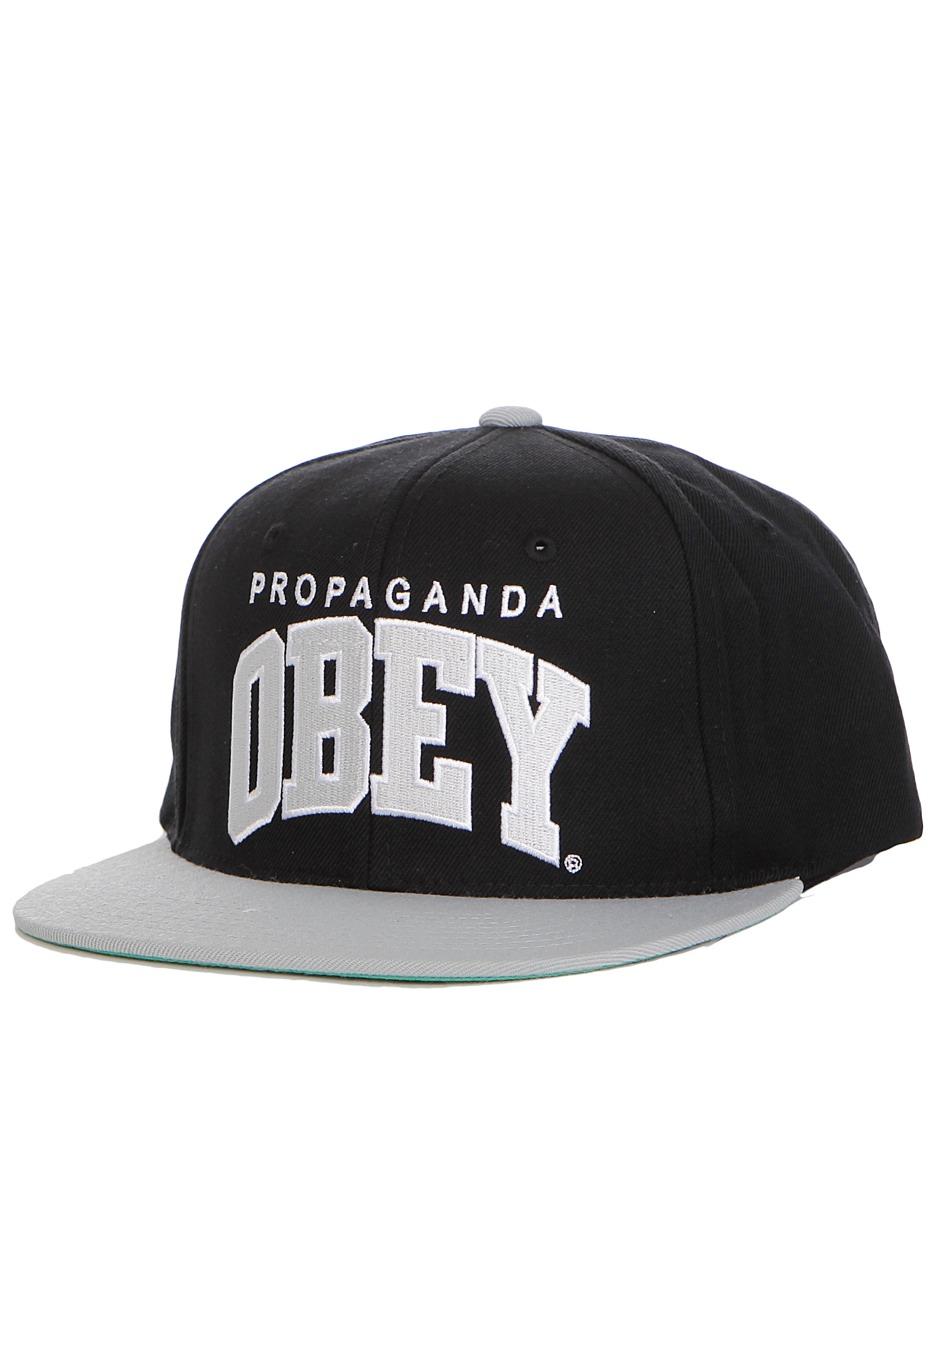 096ec5afedaa3 Obey - Throwback Black Silver Snapback - Cap - Streetwear Shop -  Impericon.com UK